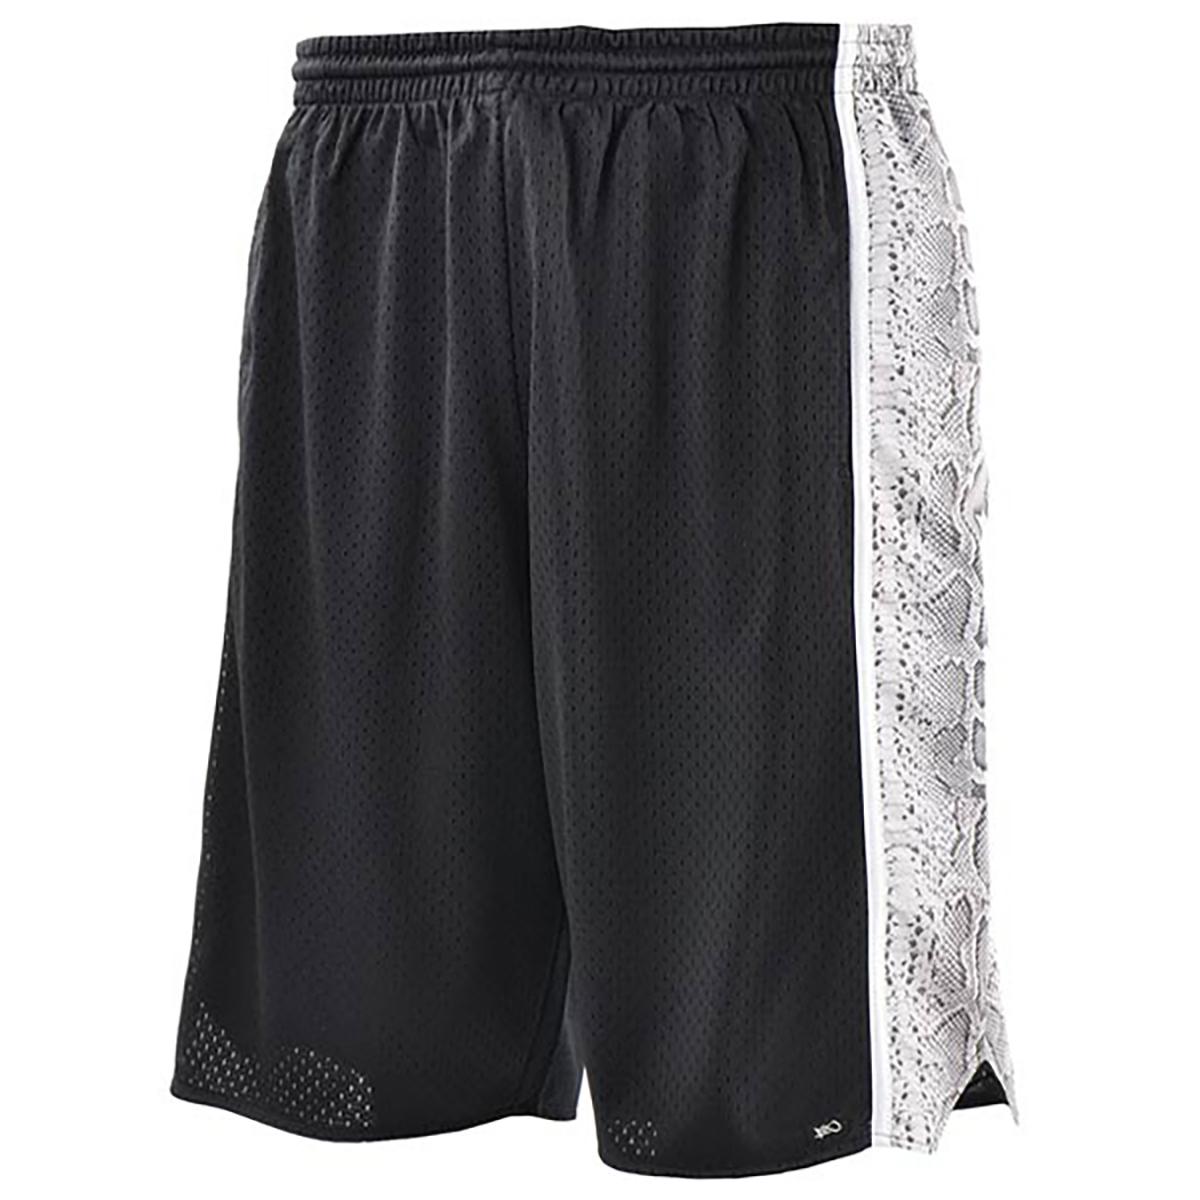 snakeskin panel shorts